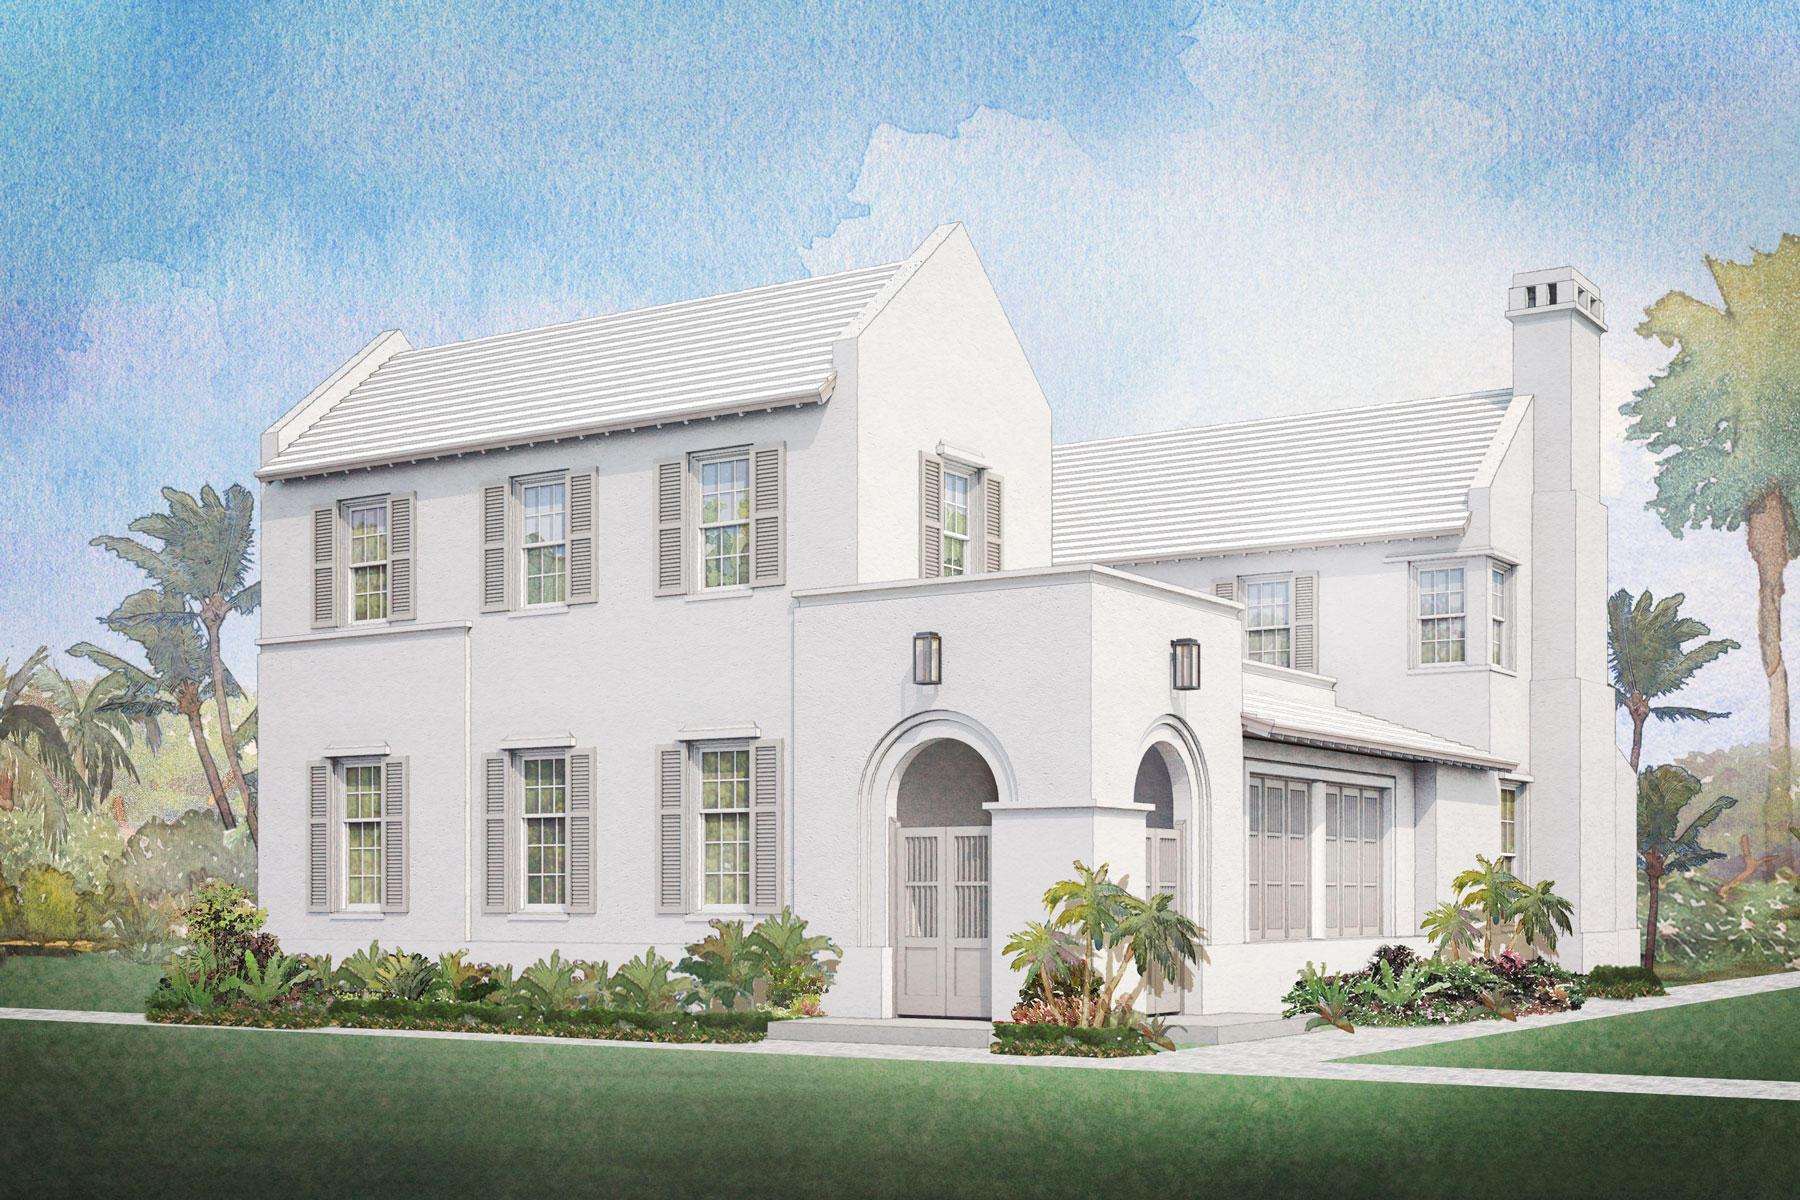 50 Lemon Hill Aly Z6, Alys Beach, FL, 32461